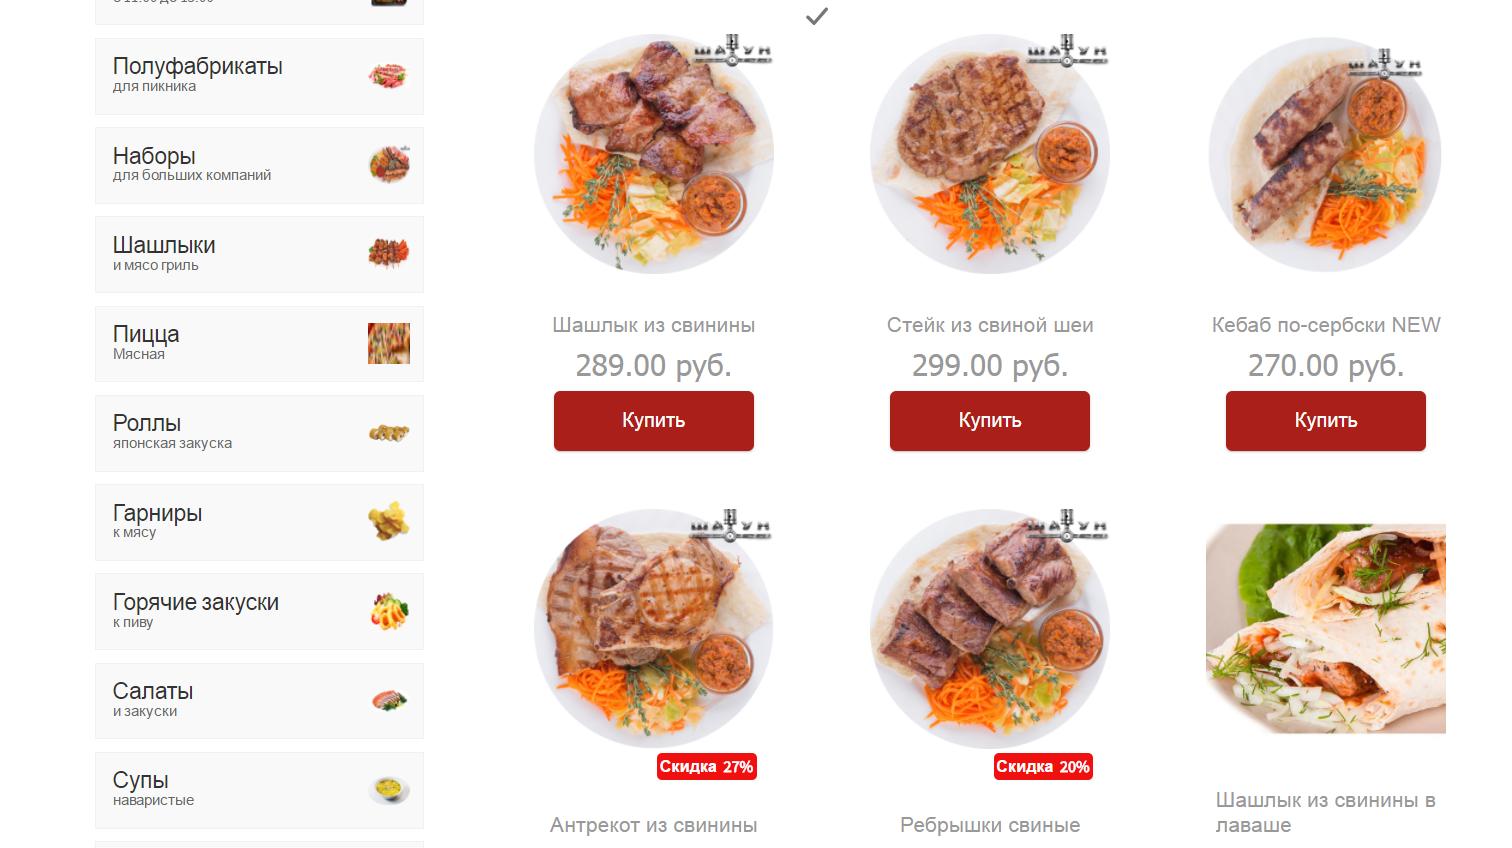 Меню интернет-магазина 3250502.ru